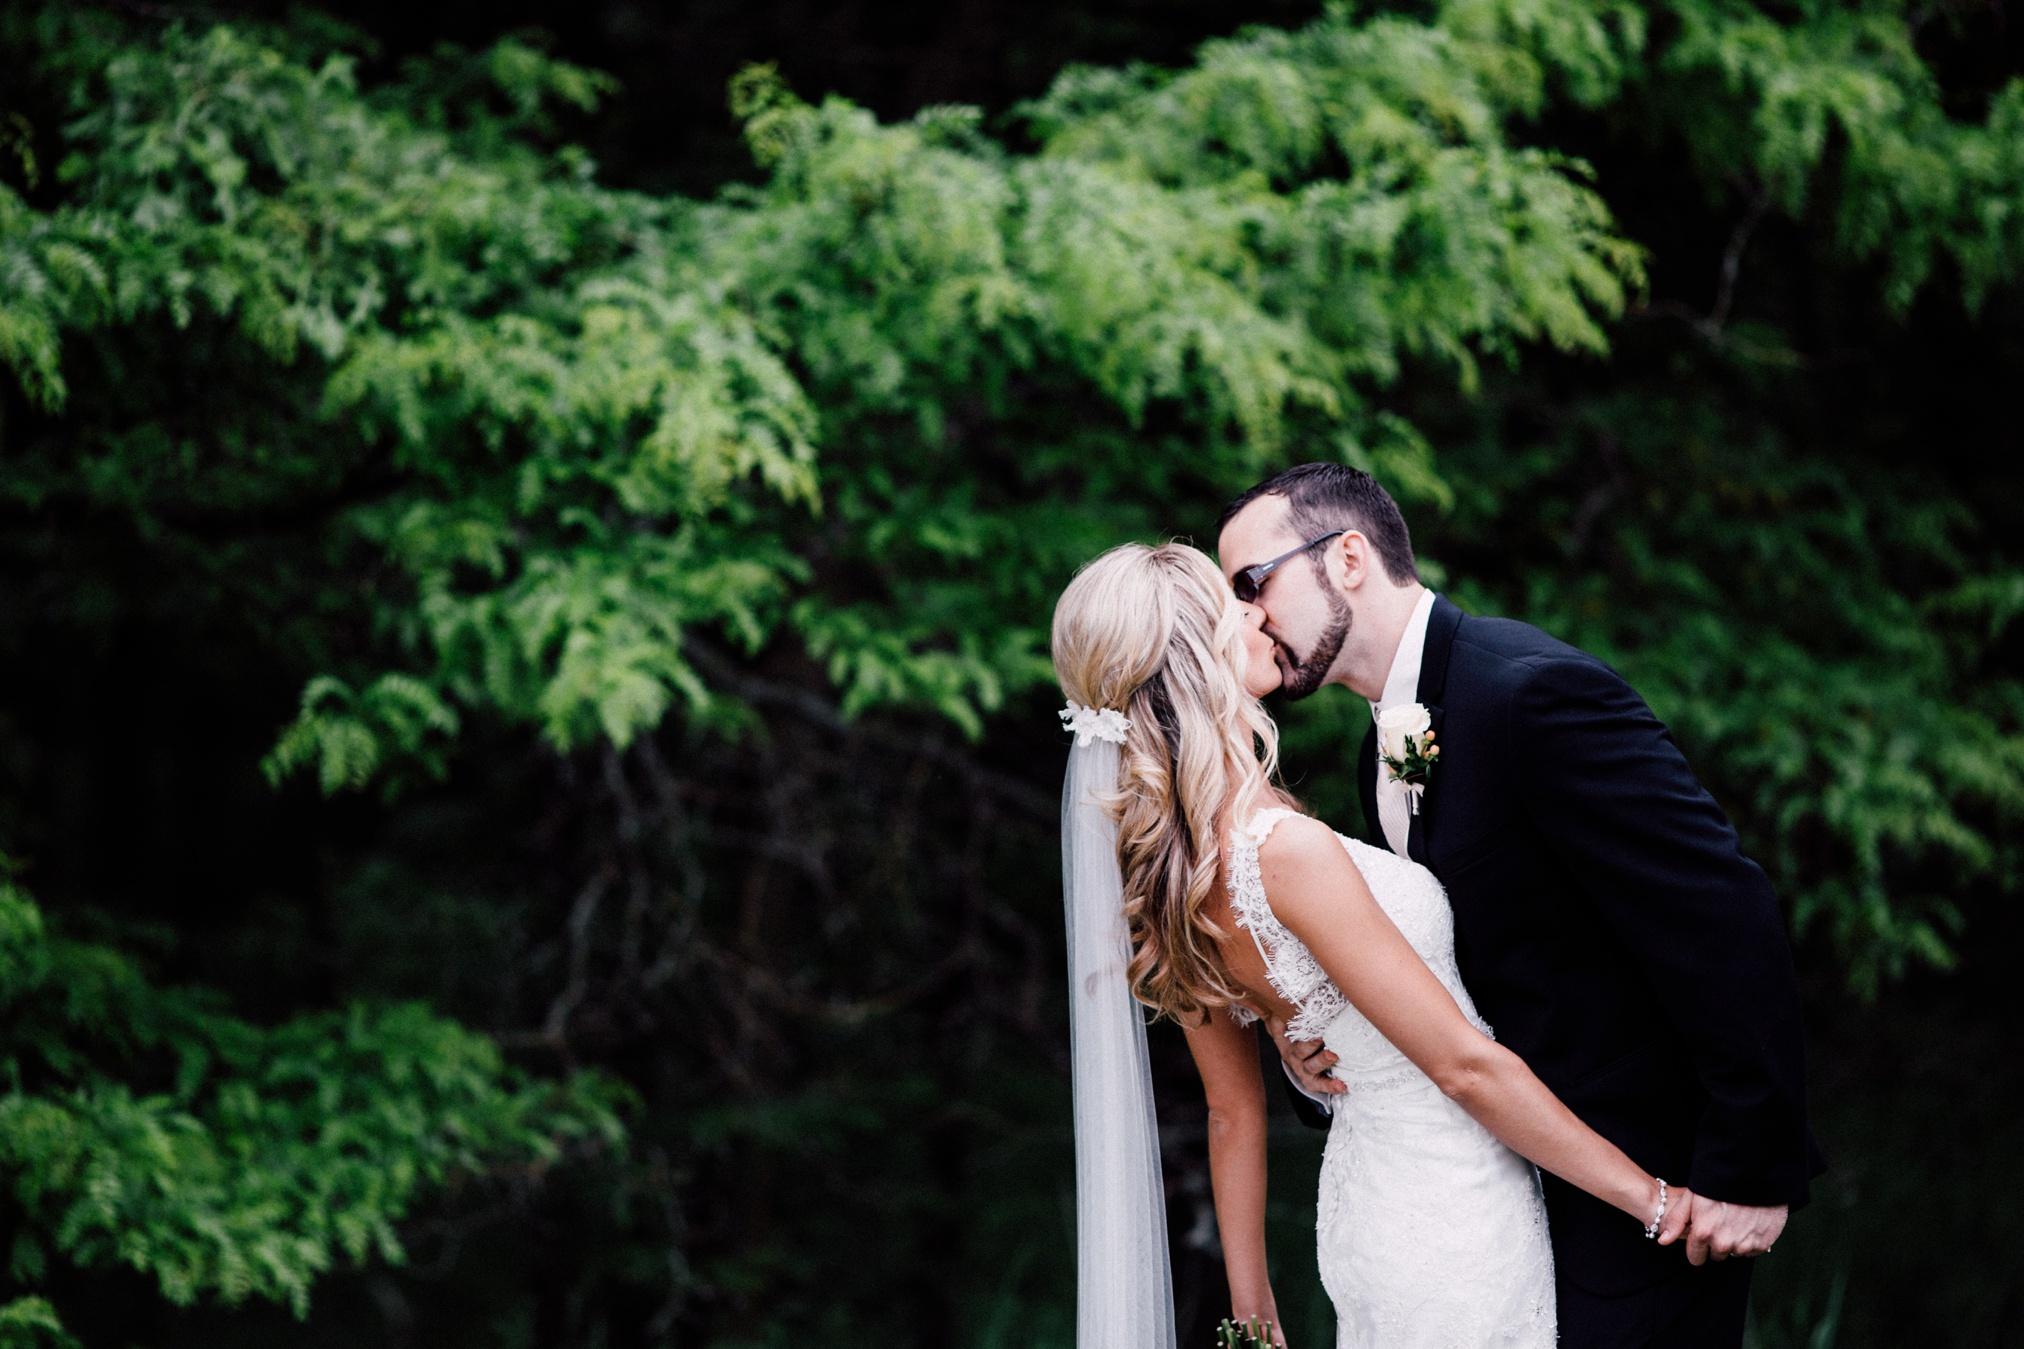 schmid_wedding-656.jpg